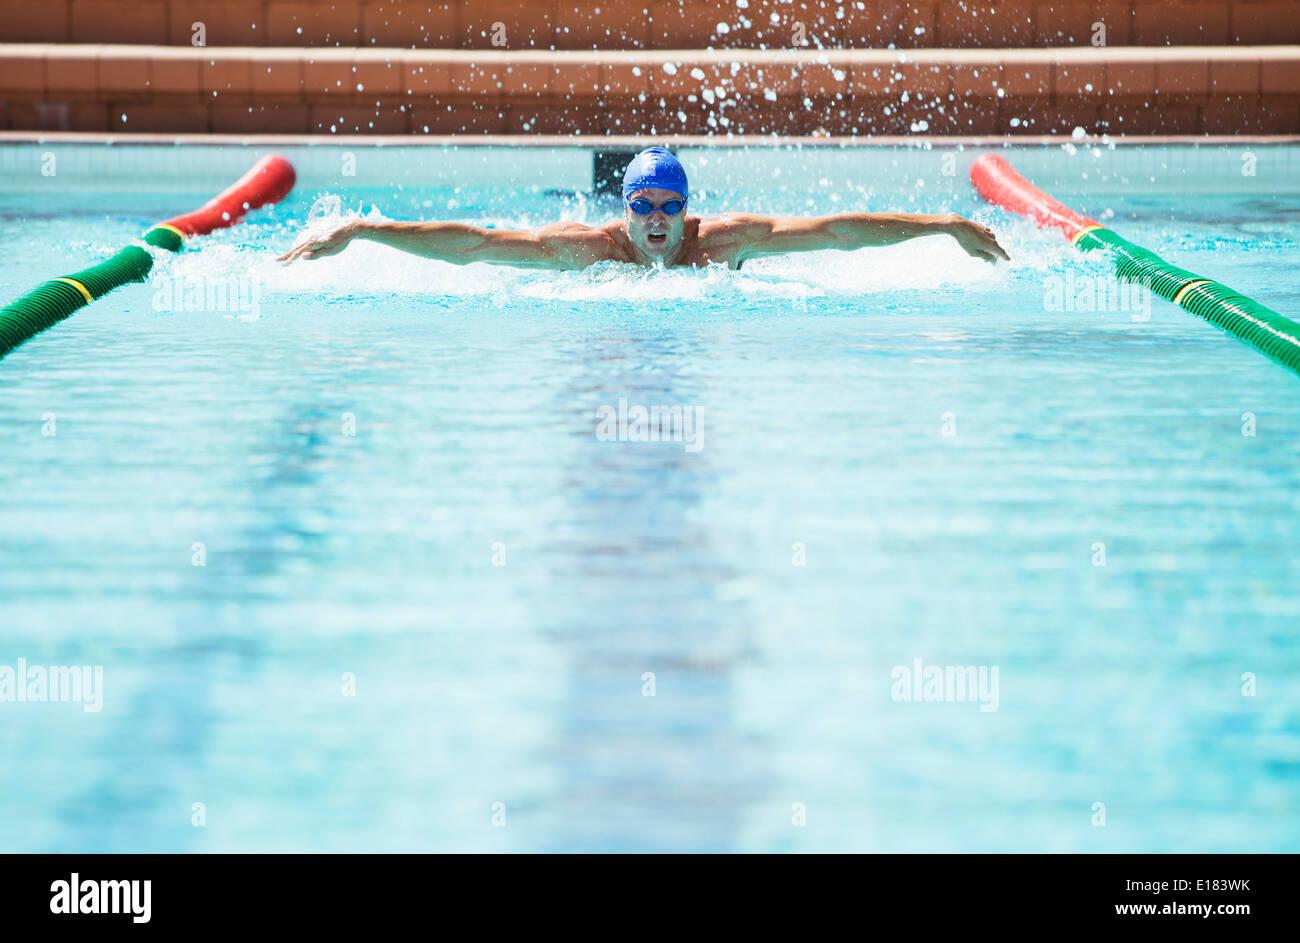 Swimmer racing in pool Photo Stock